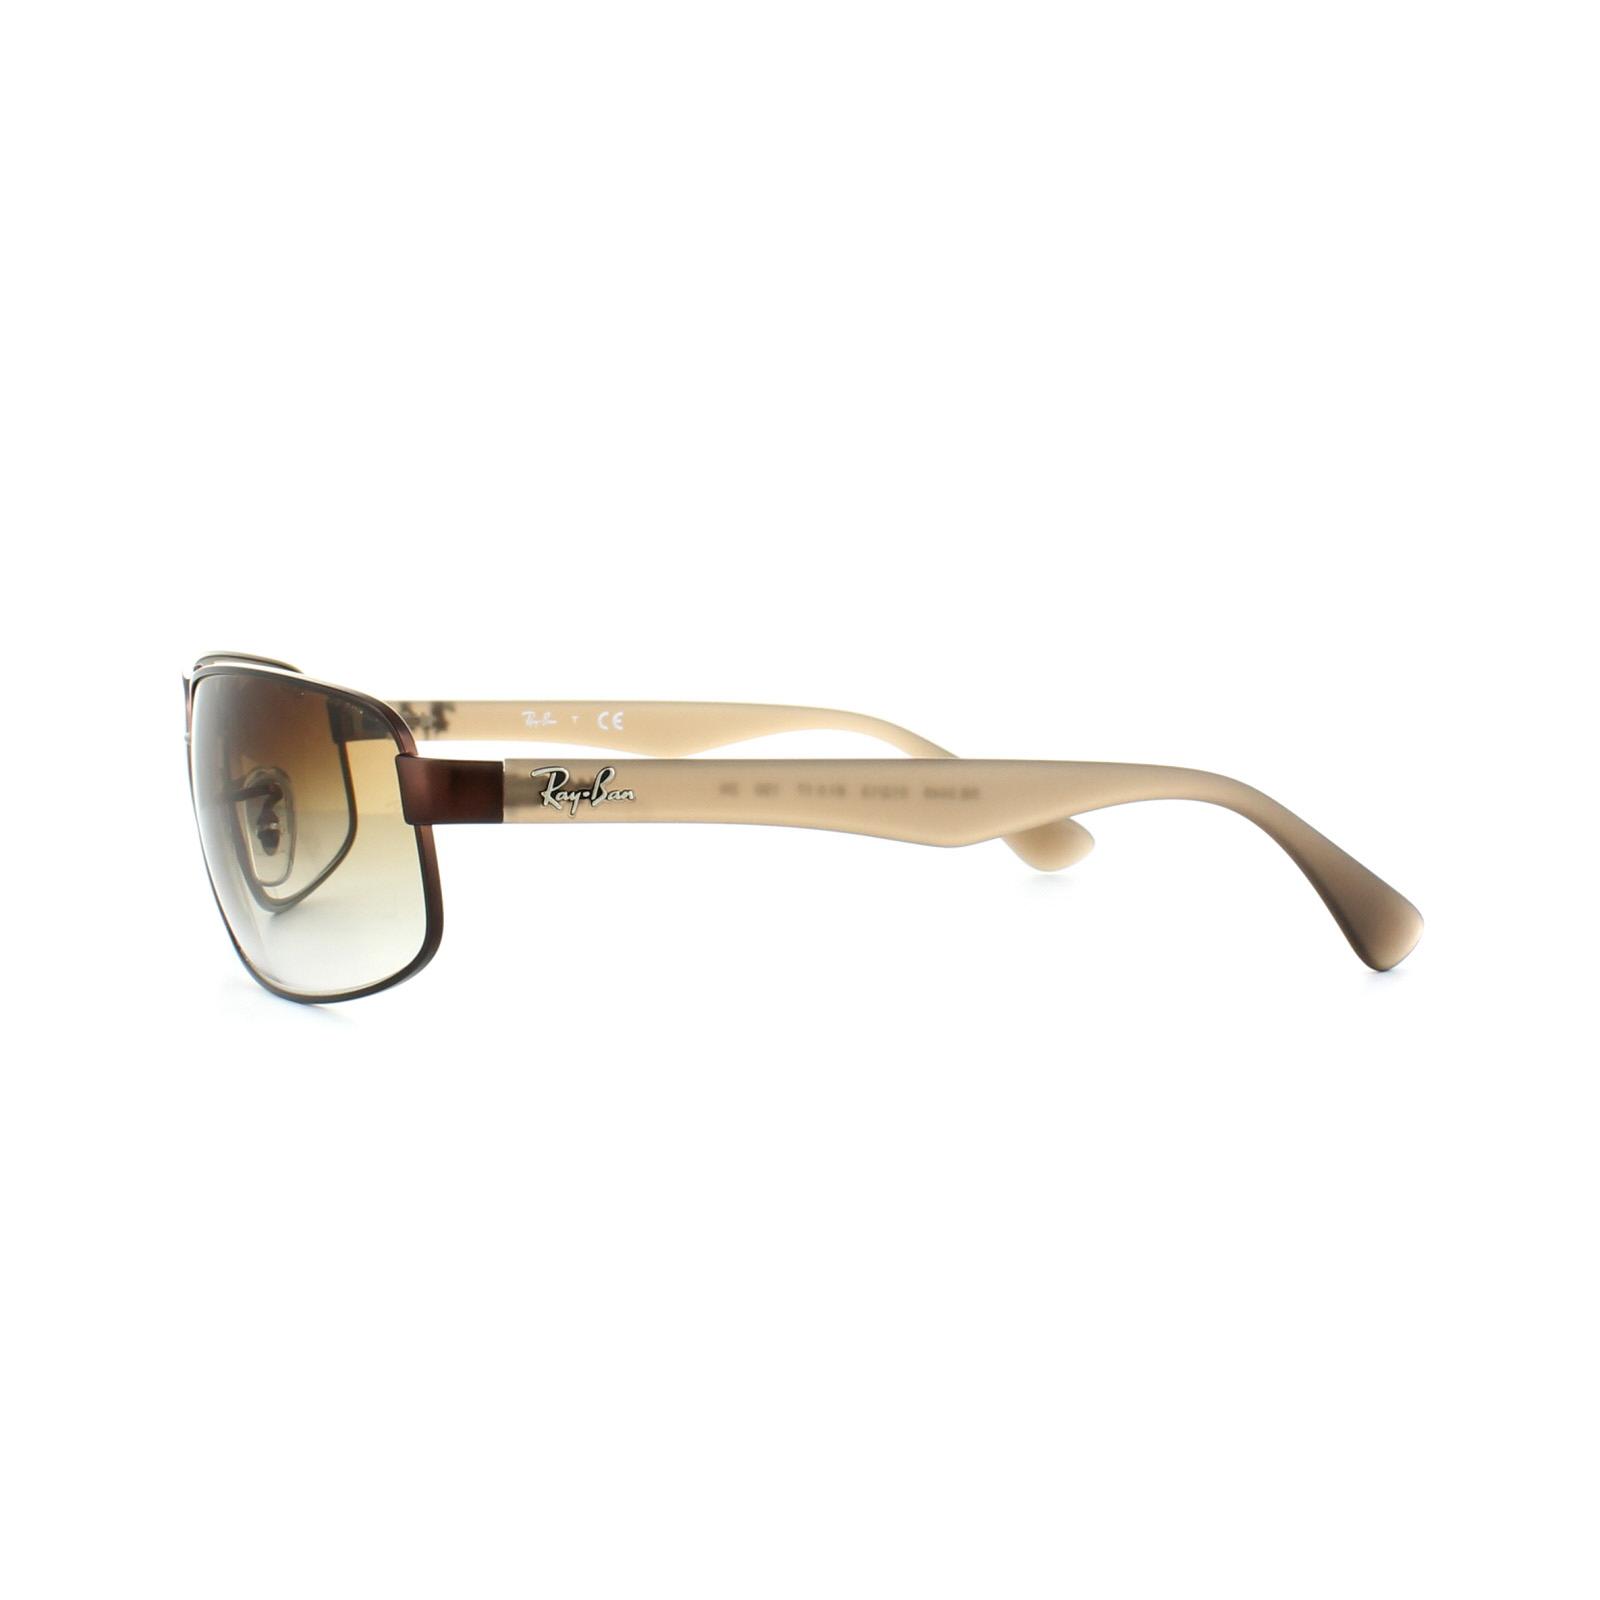 df1db60ac517e Ray-Ban Sunglasses 3445 012 13 Brown Brown Gradient 8053672743791   eBay